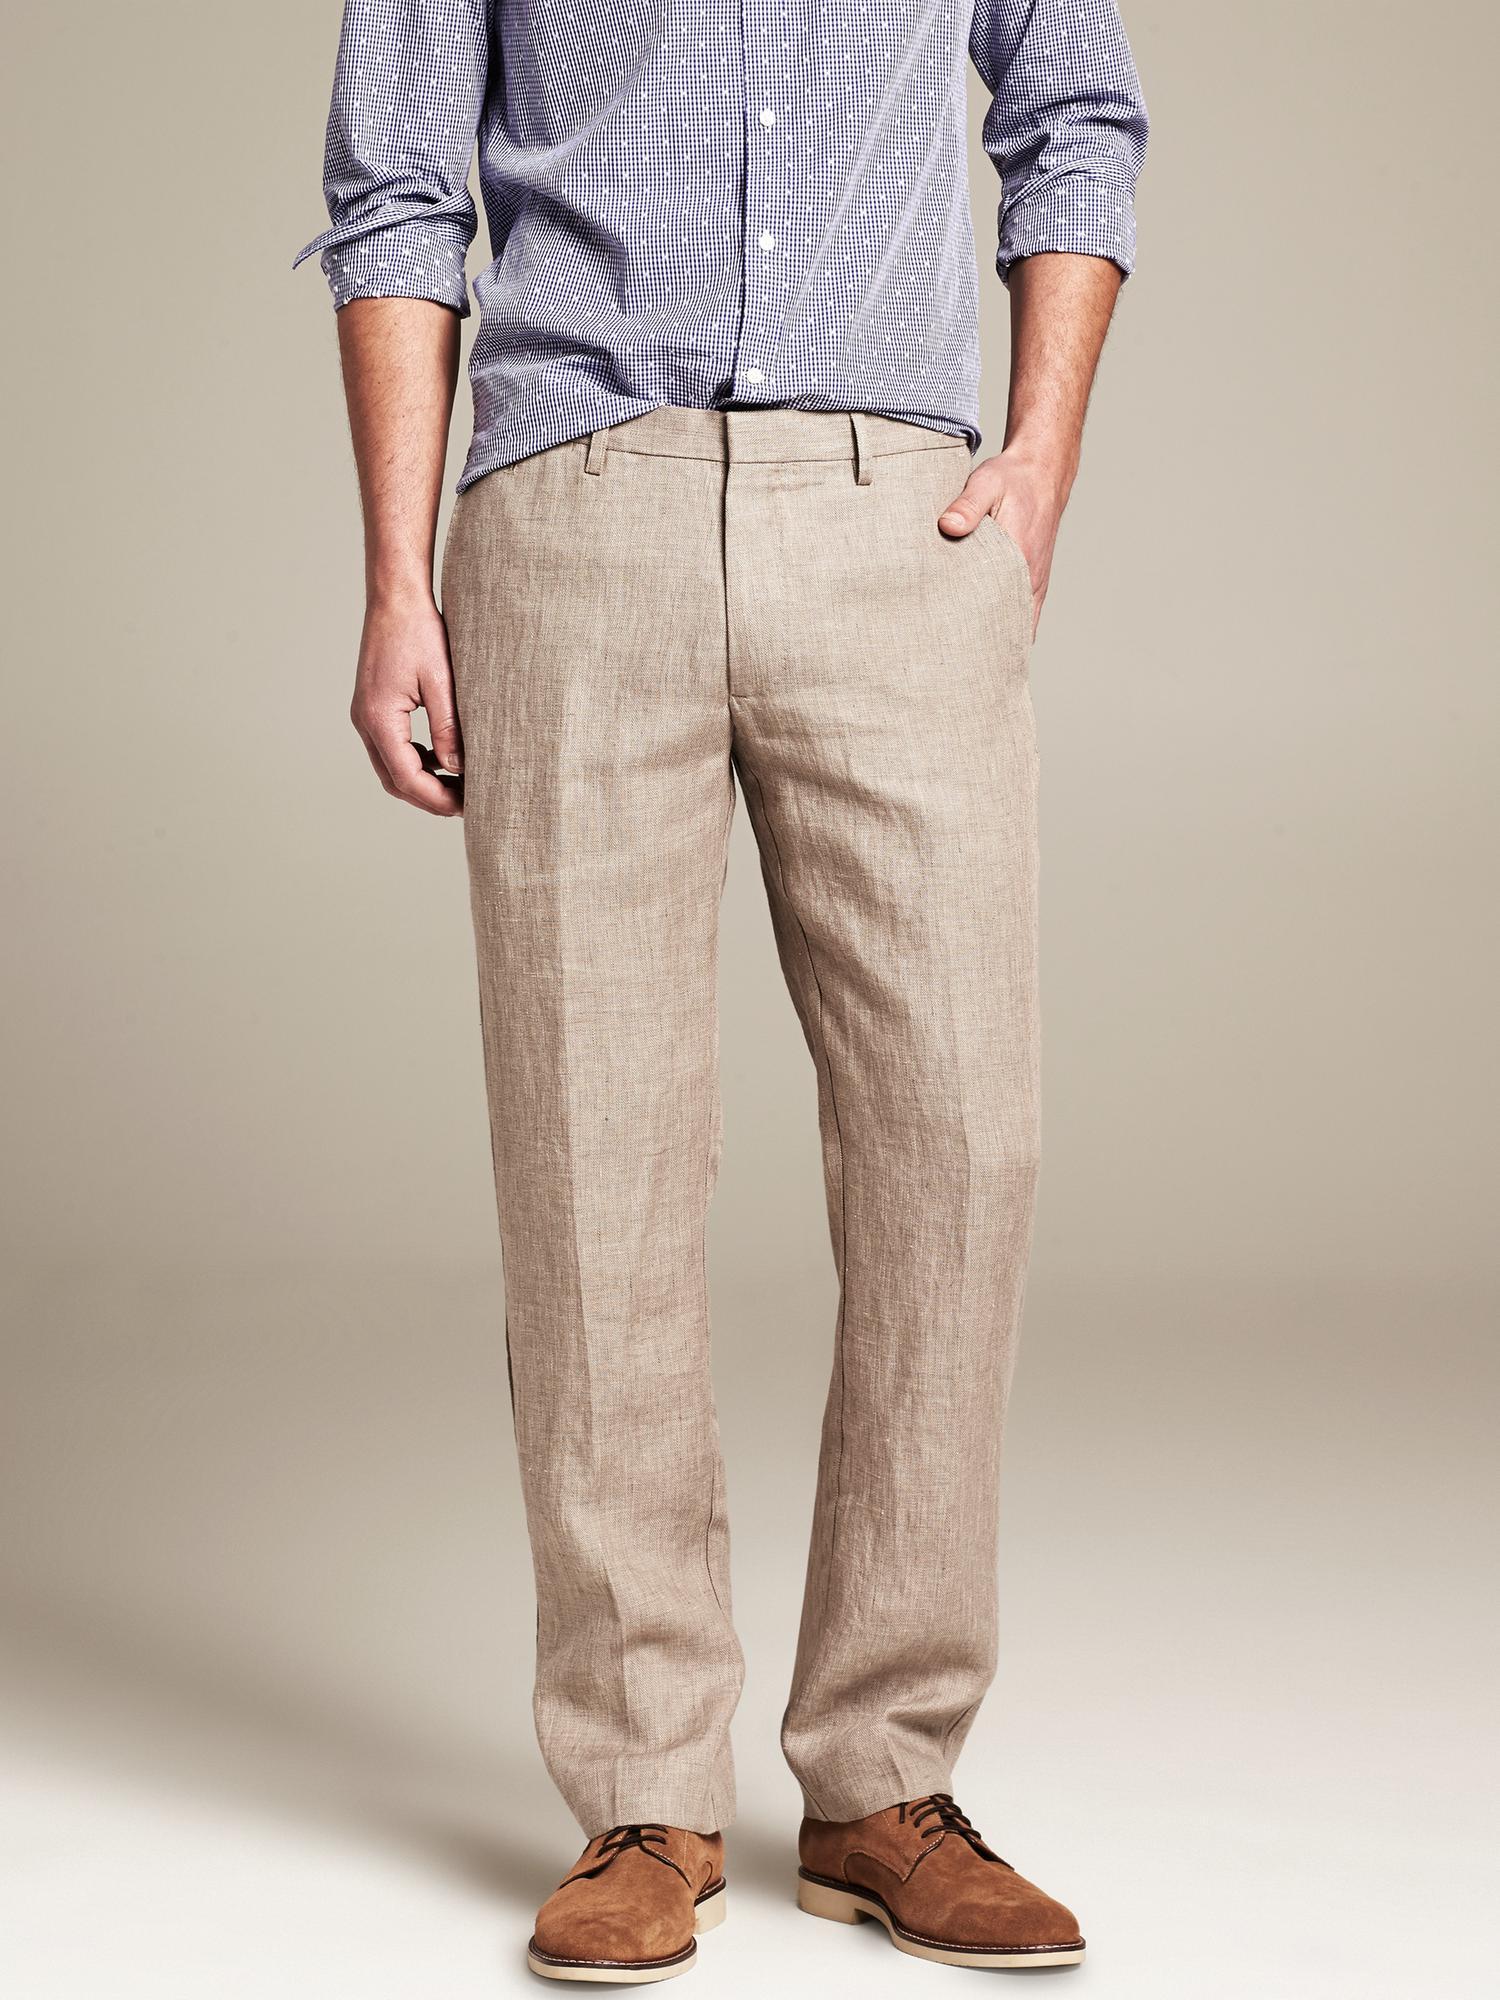 Lyst Banana Republic Heritage Linen Pant In Natural For Men